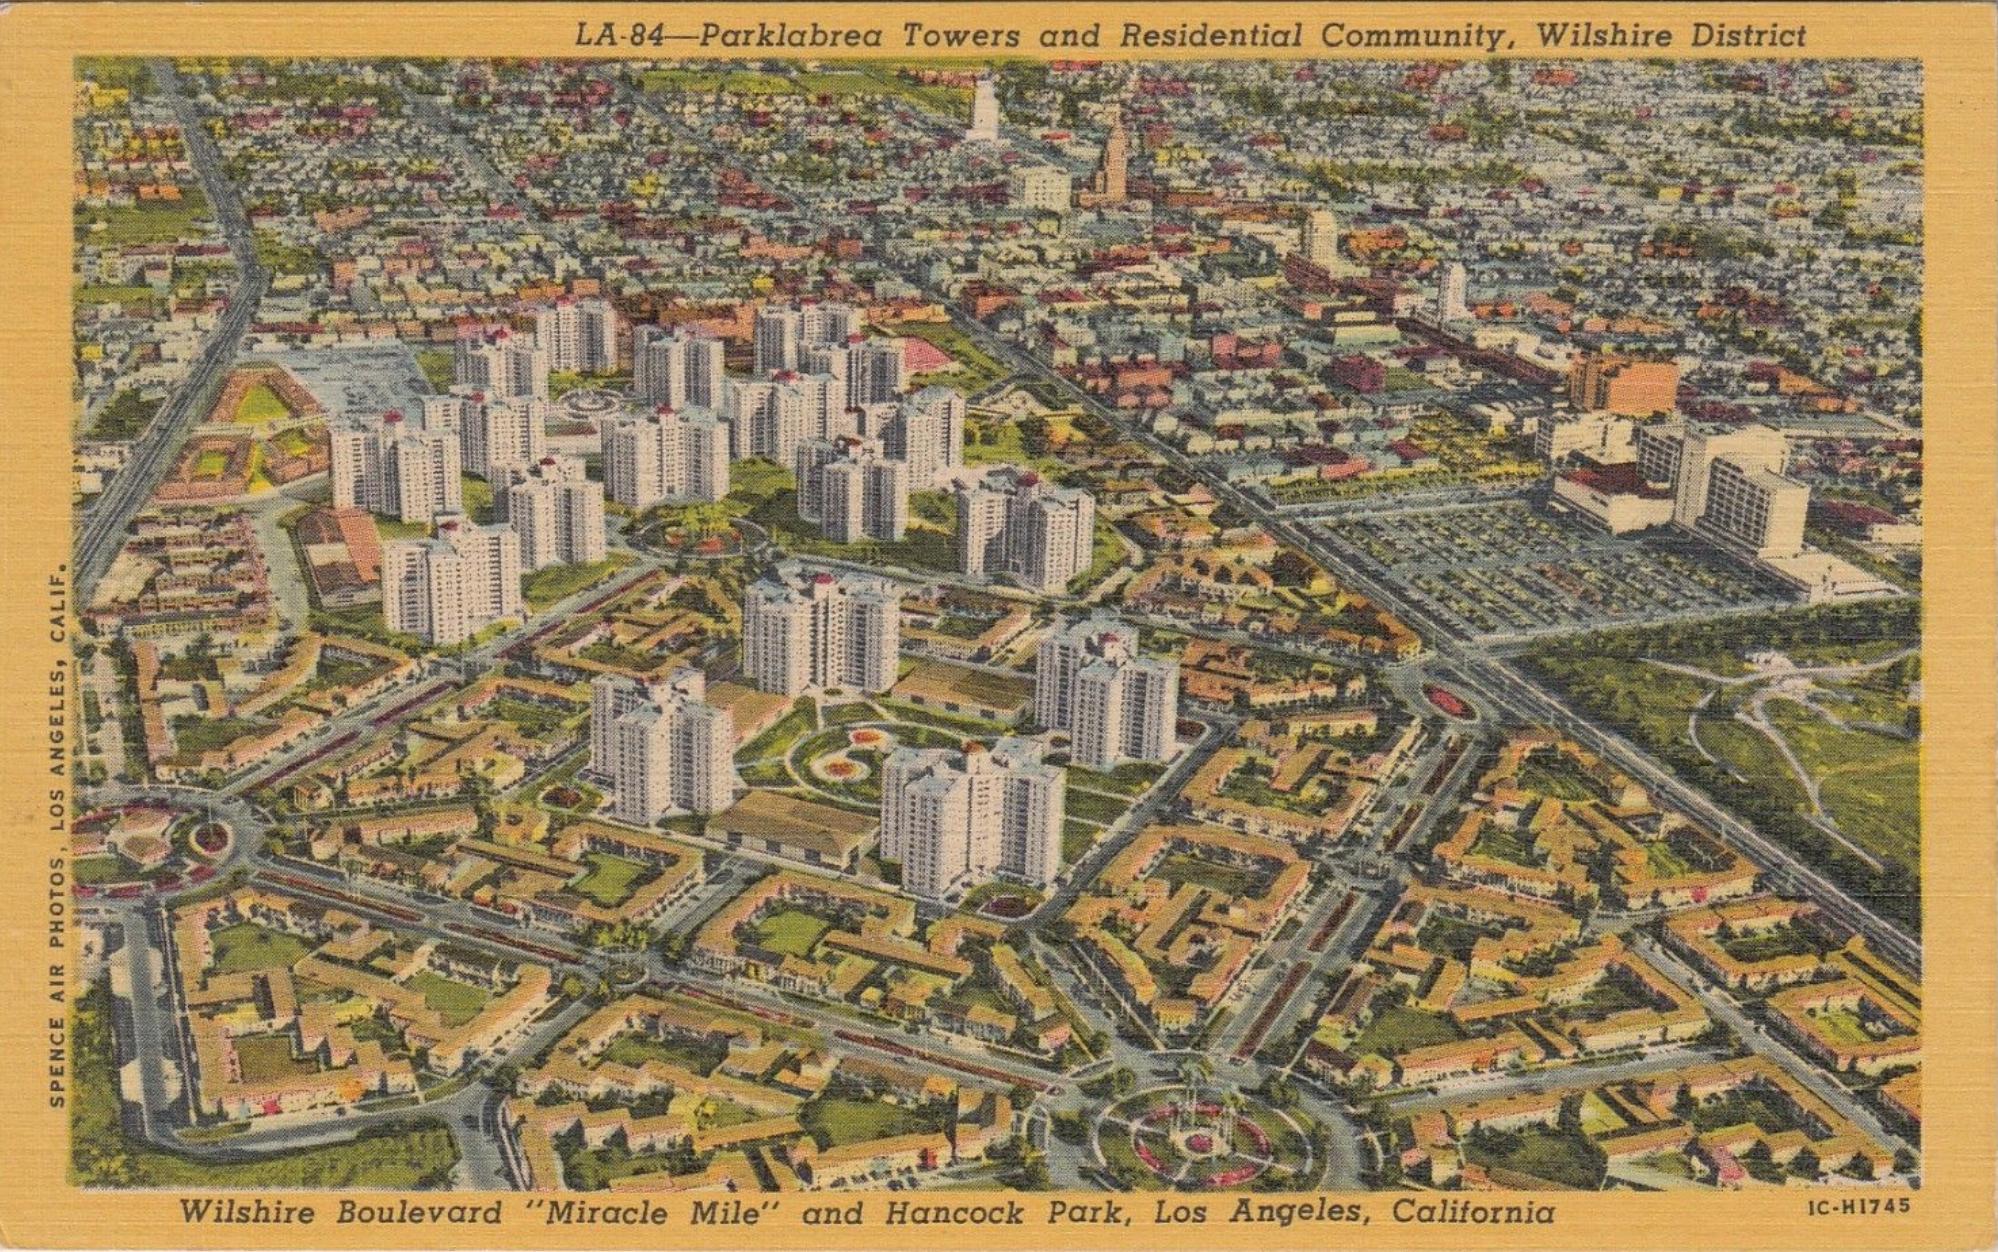 Park La Brea postcard, circa 1950 | Miracle Mile Residential Association